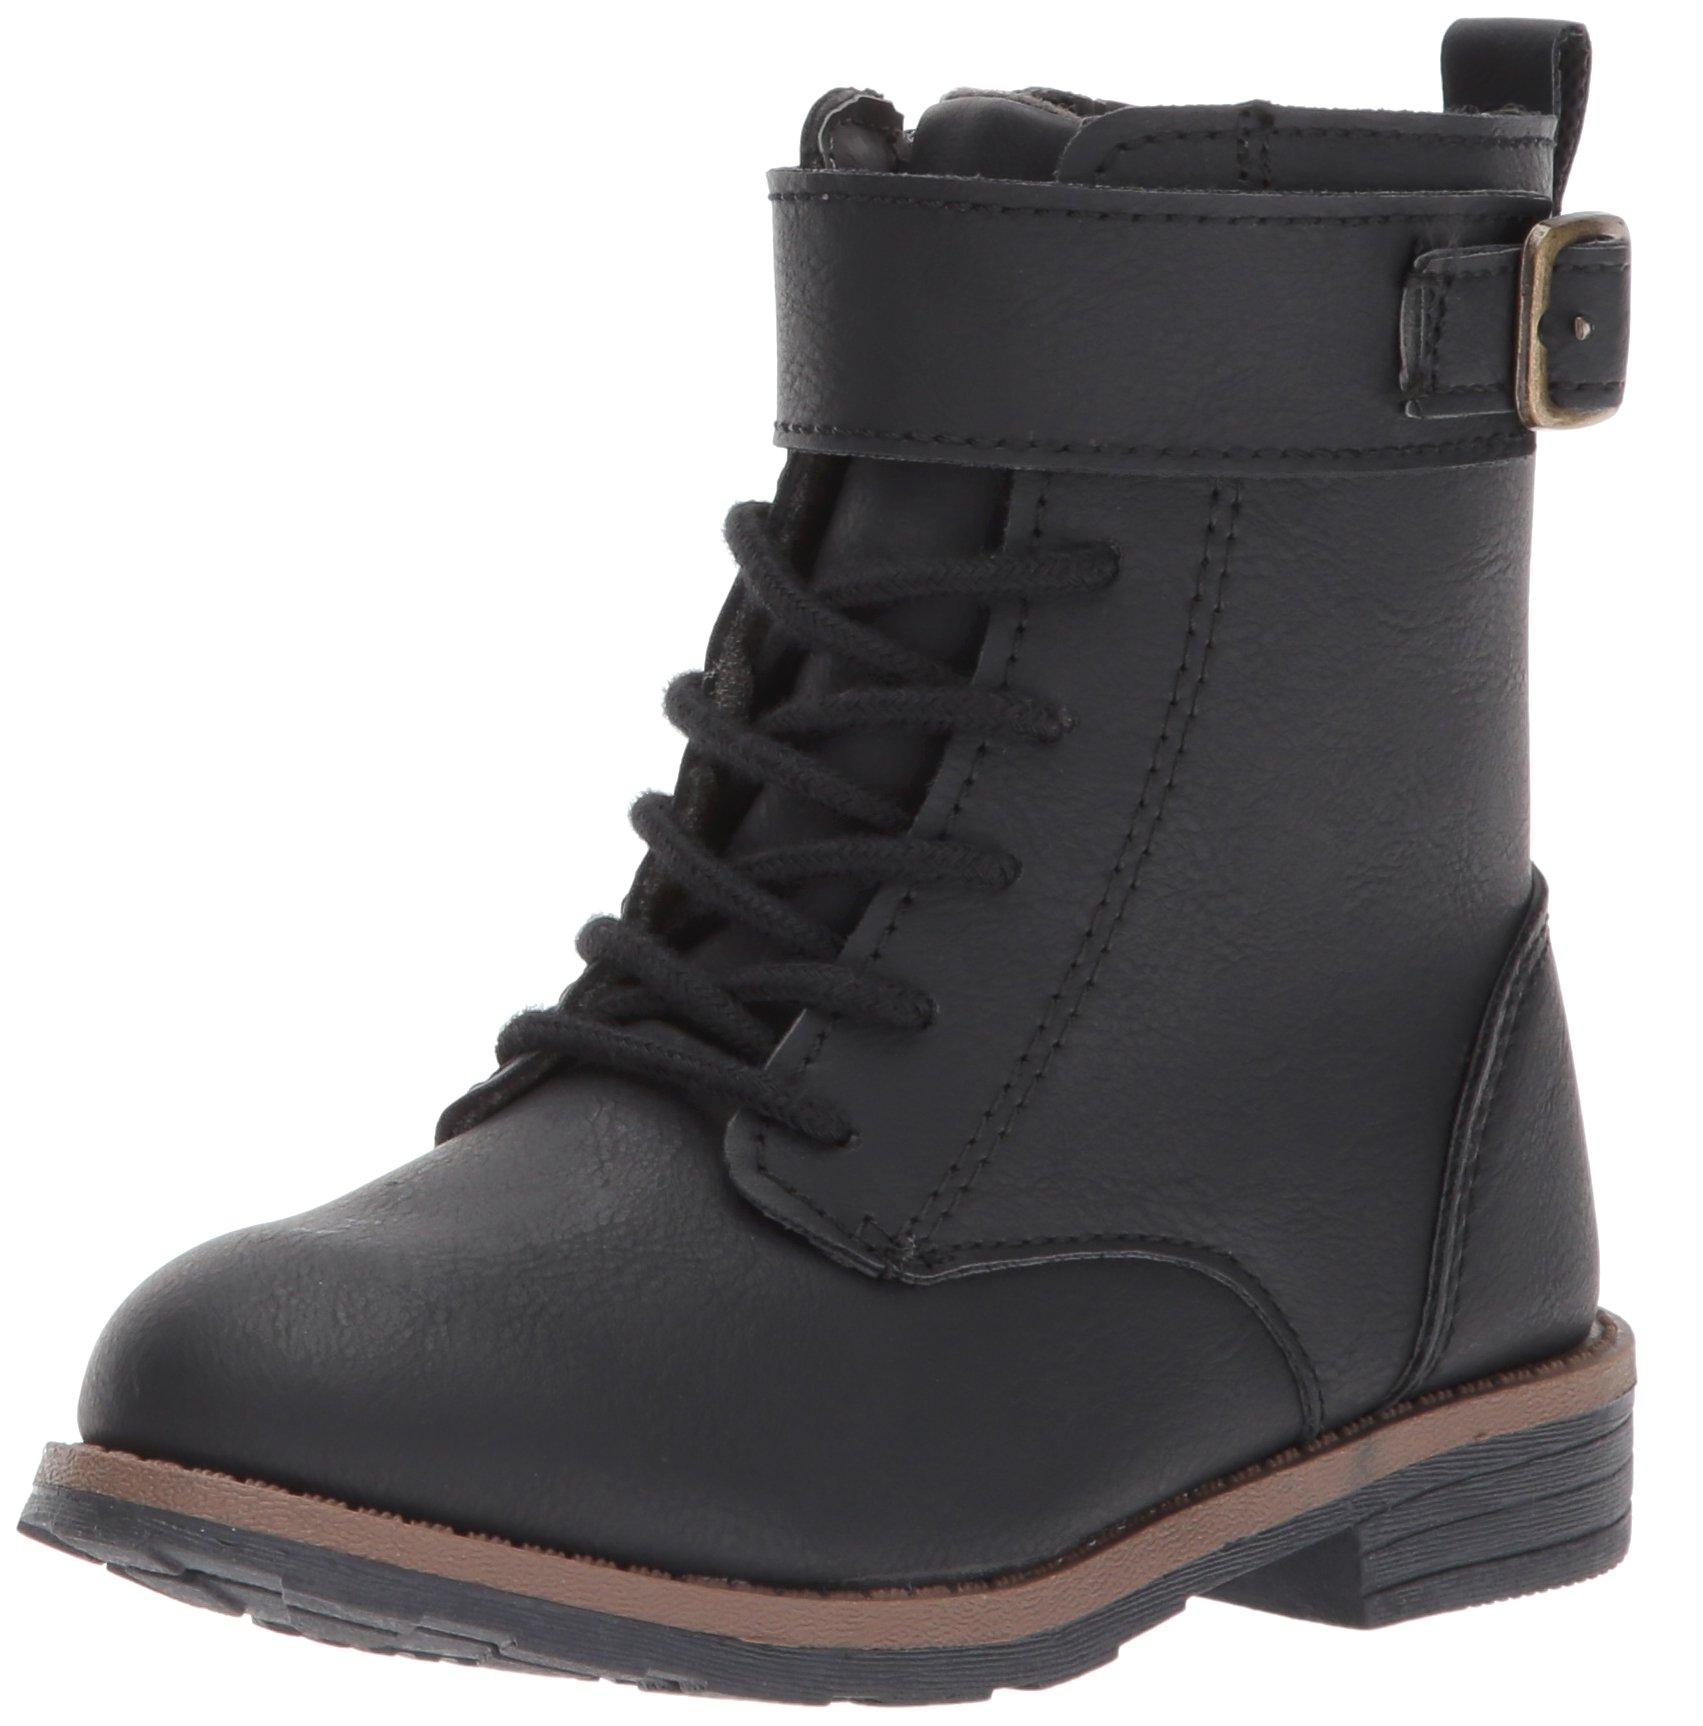 Carter's Girls' Comrade2 Fashion Boot, Black, 11 M US Little Kid